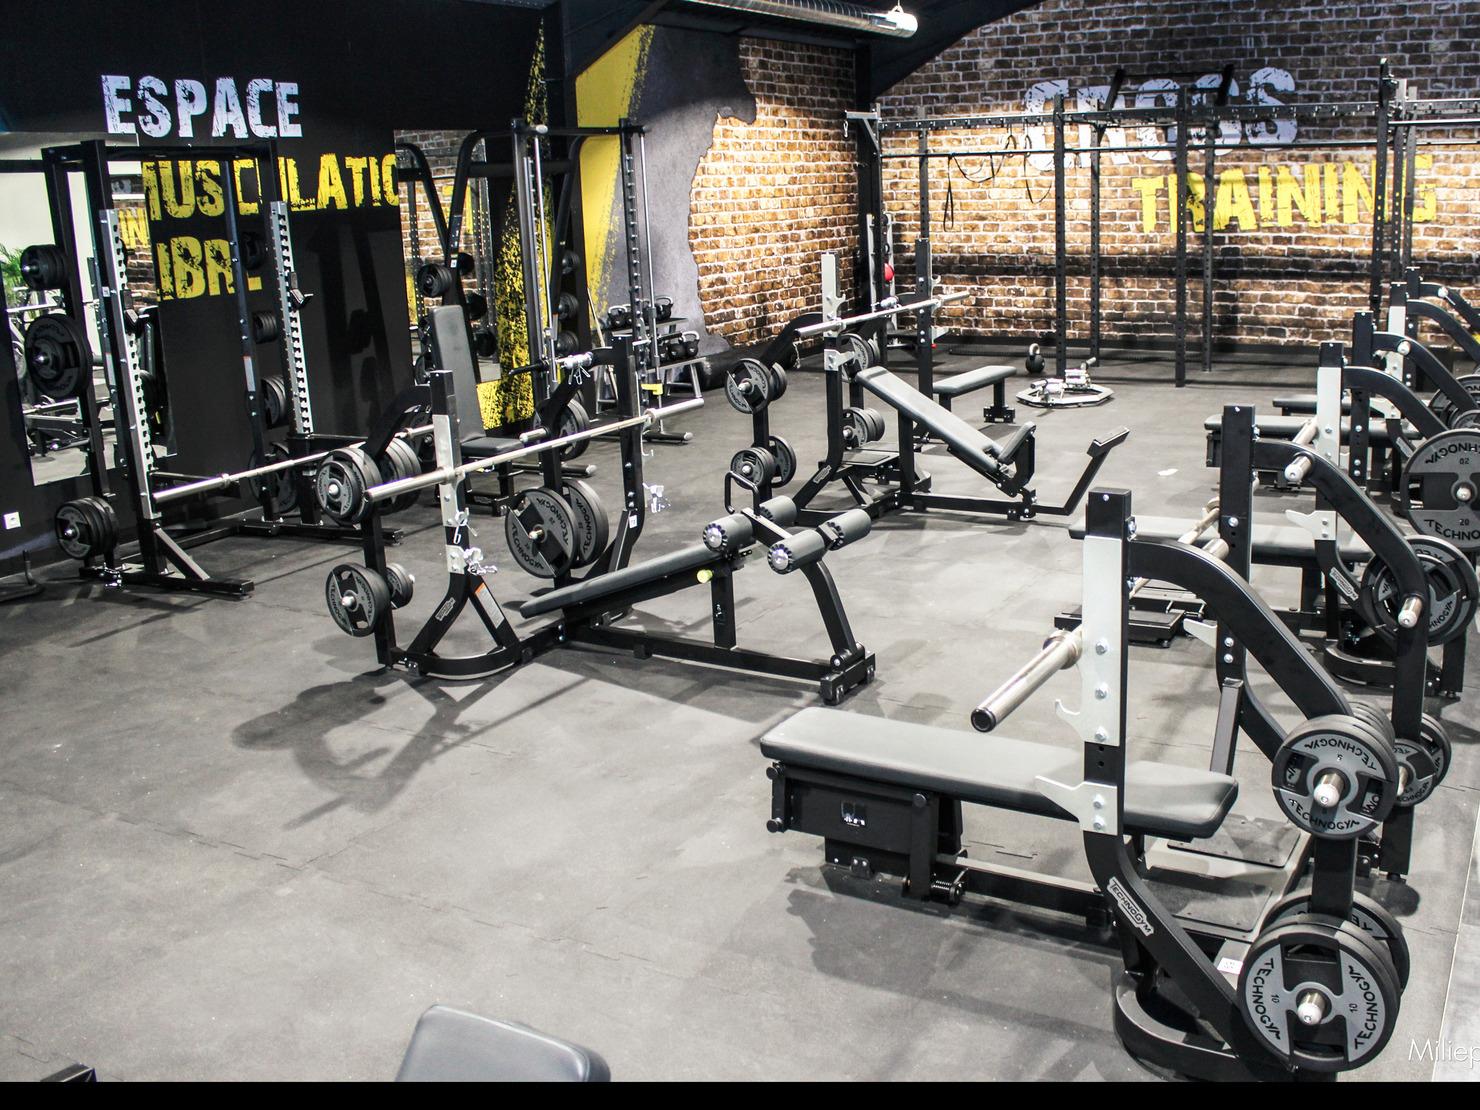 Fitness Park Coulommiers | Tarifs, Avis, Horaires, Offre ... concernant Piscine Coulommiers Horaires